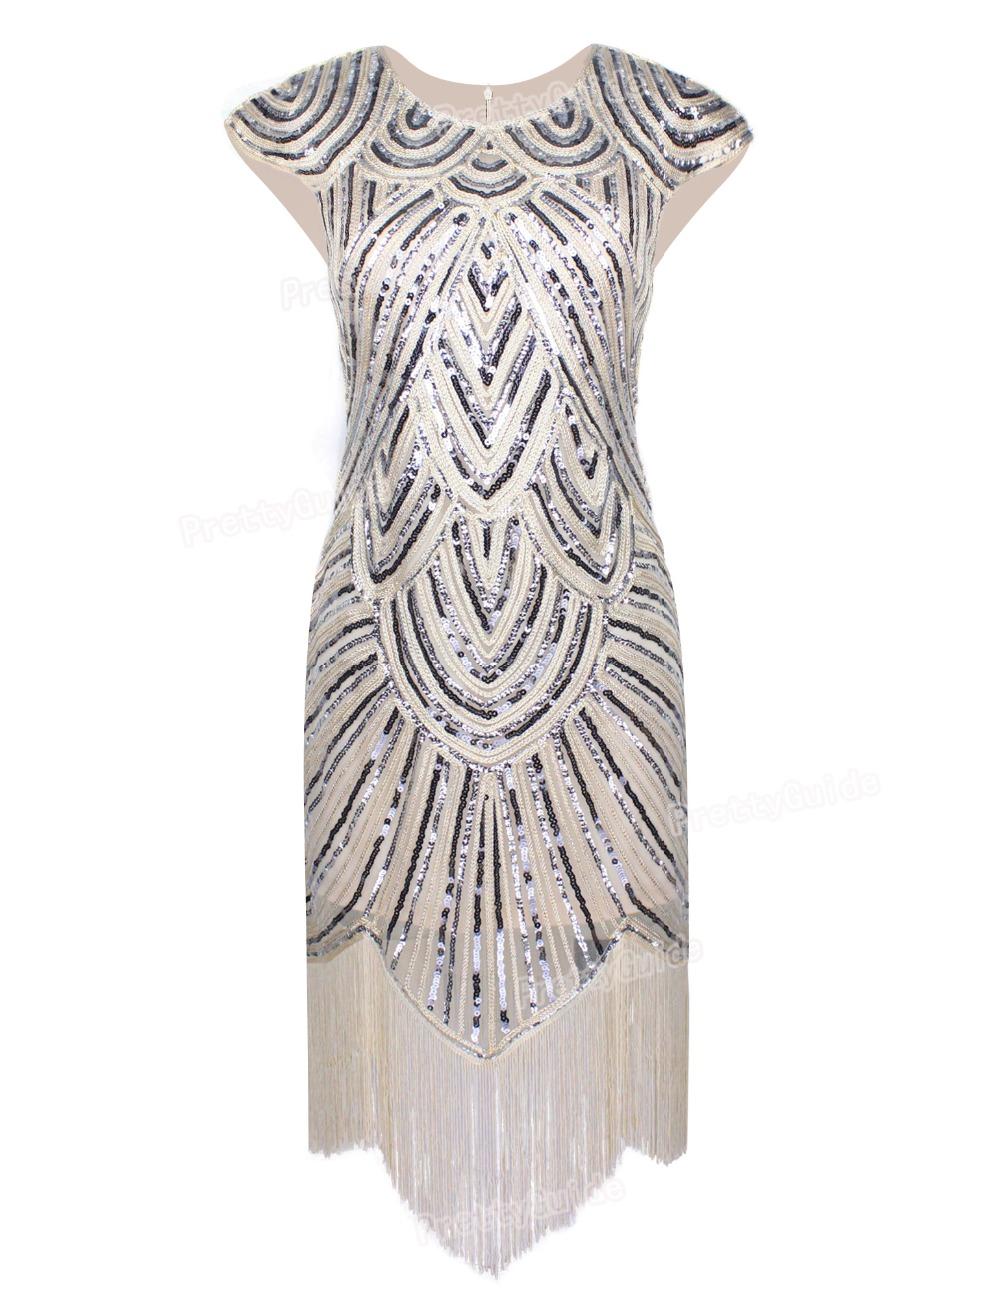 abb092bfef28 PrettyGuide Women 1920s Vintage Great Gatsby Art Deco Sequin Embellished  Fringed Hem Cocktail Flapper Dress